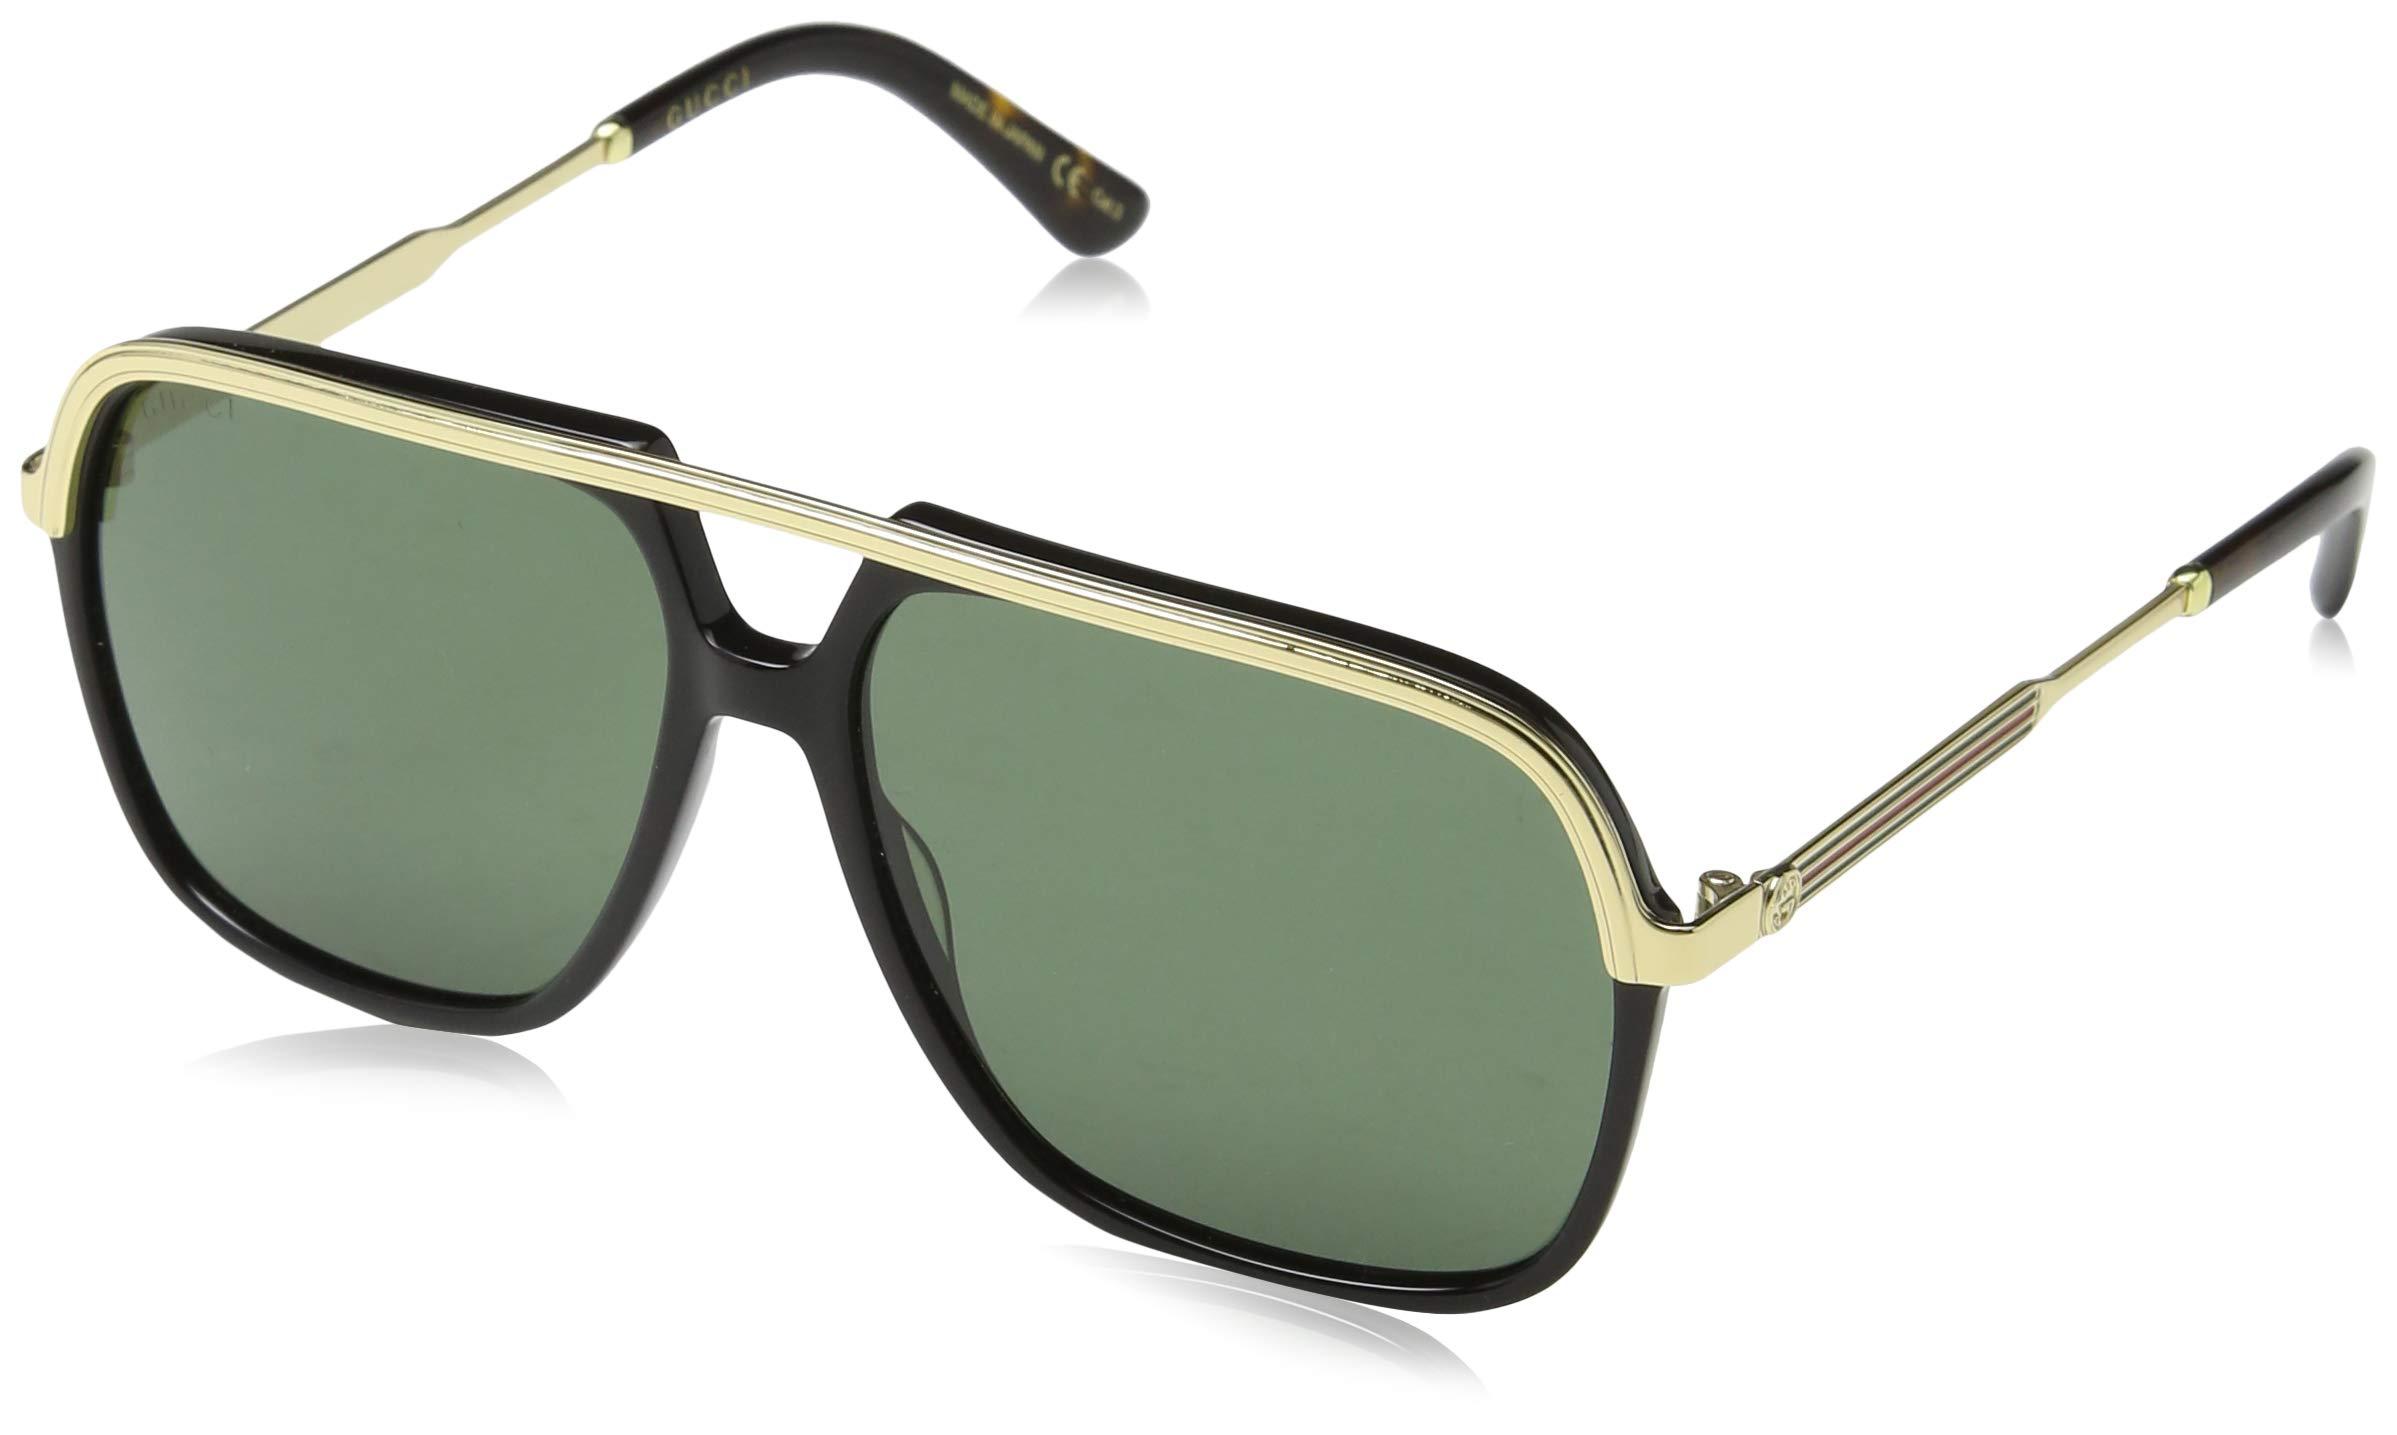 41289c60883 Gucci GG0200S 001 Black Gold GG0200S Square Pilot Sunglasses Lens Category 3